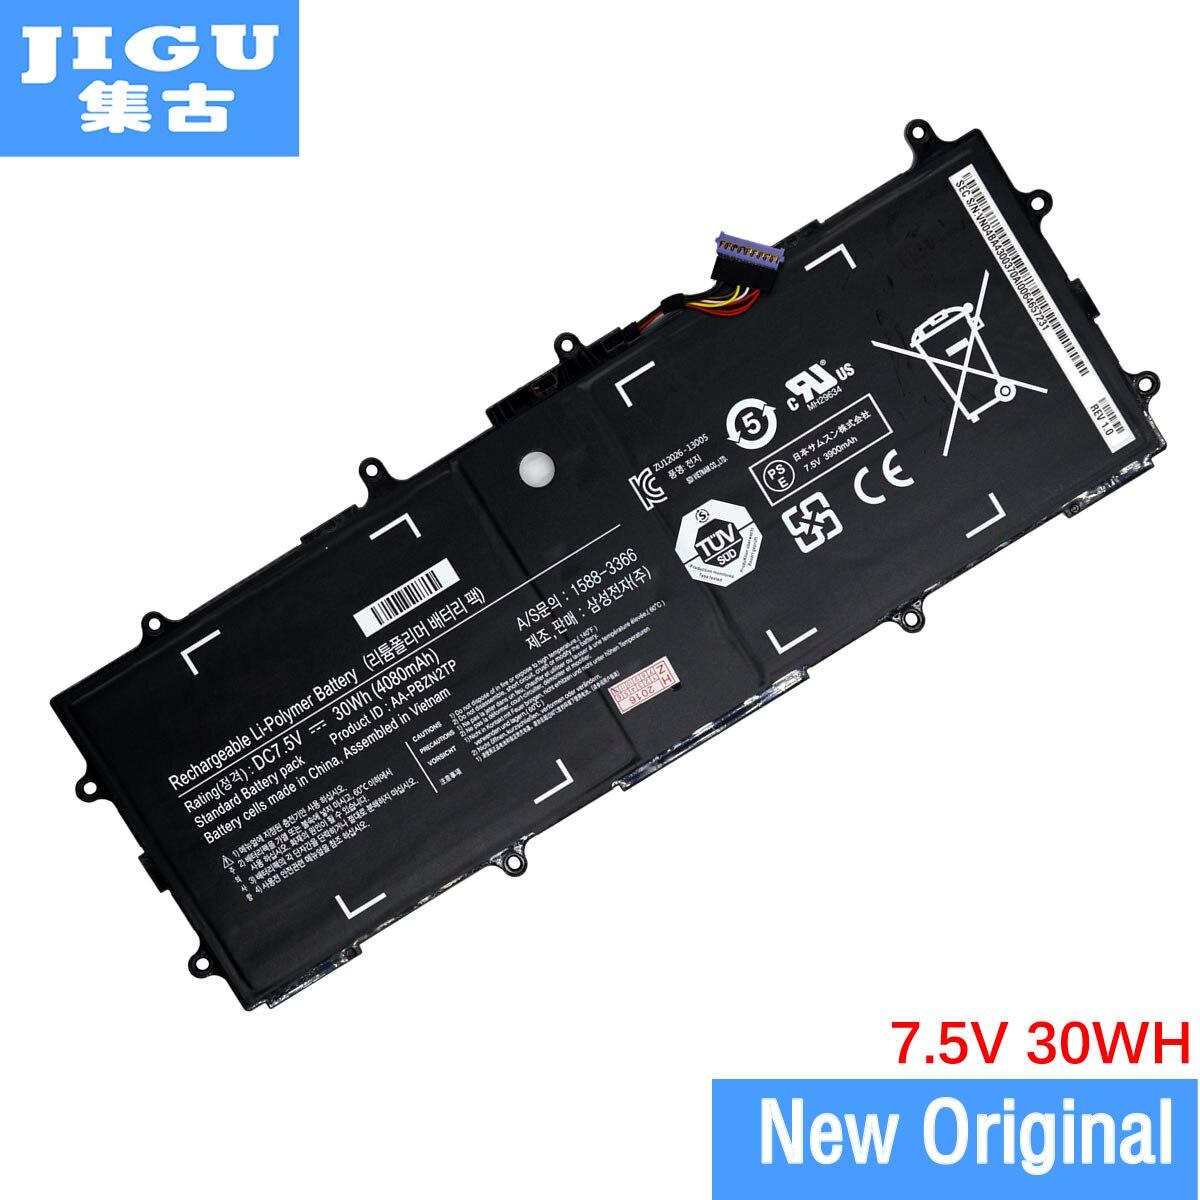 JIGU AA-PB2N2TP AA-PBZN2TP Original batería para ordenador portátil SAMSUNG 905S3G 910S3G 915S3G XE303C12 para Chromebook 2 3 30WH